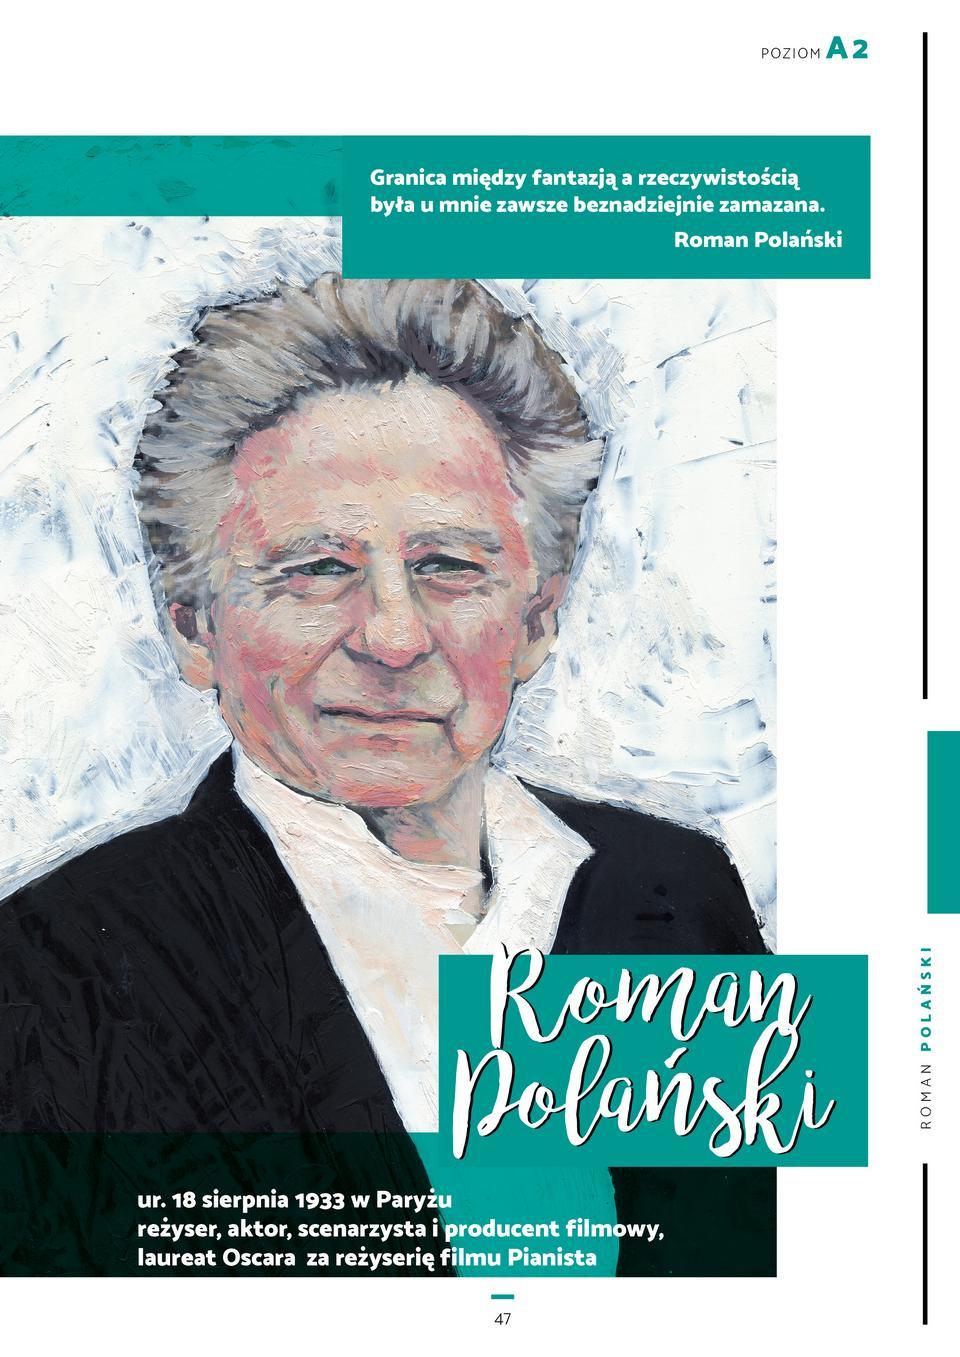 06_a2_polanski